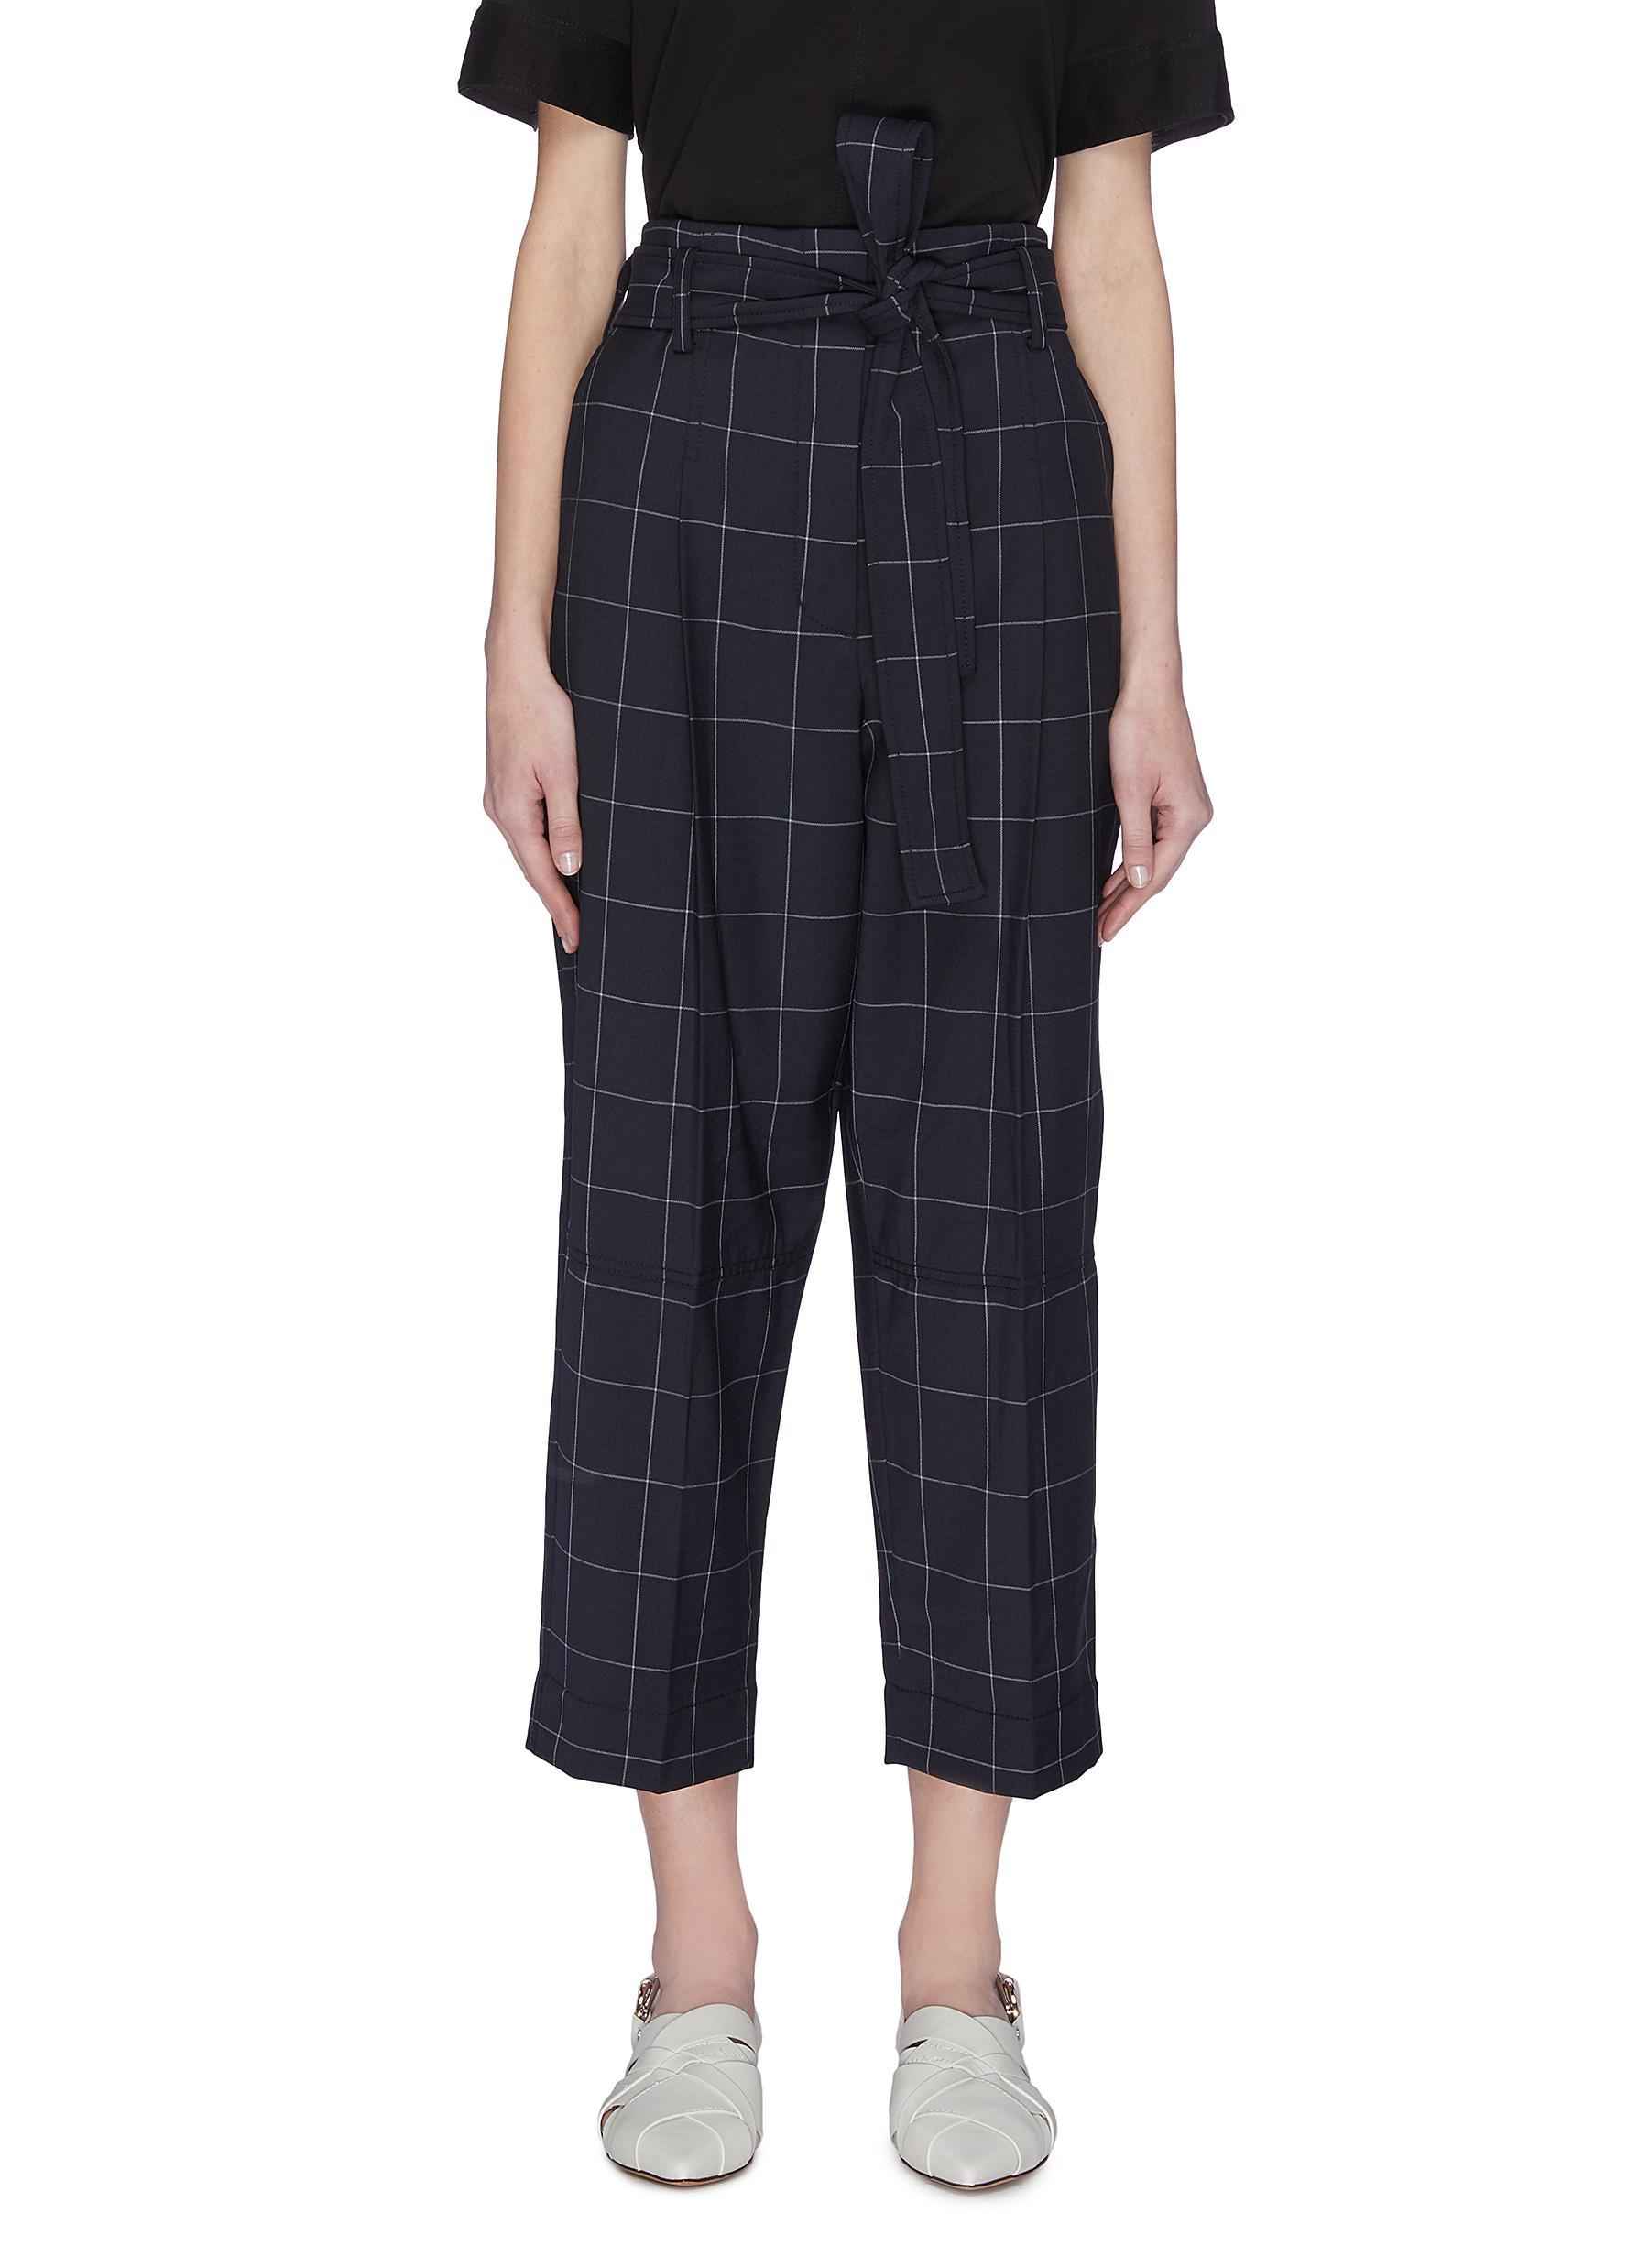 shop 3.1 Phillip Lim Windowpane check cropped pants online